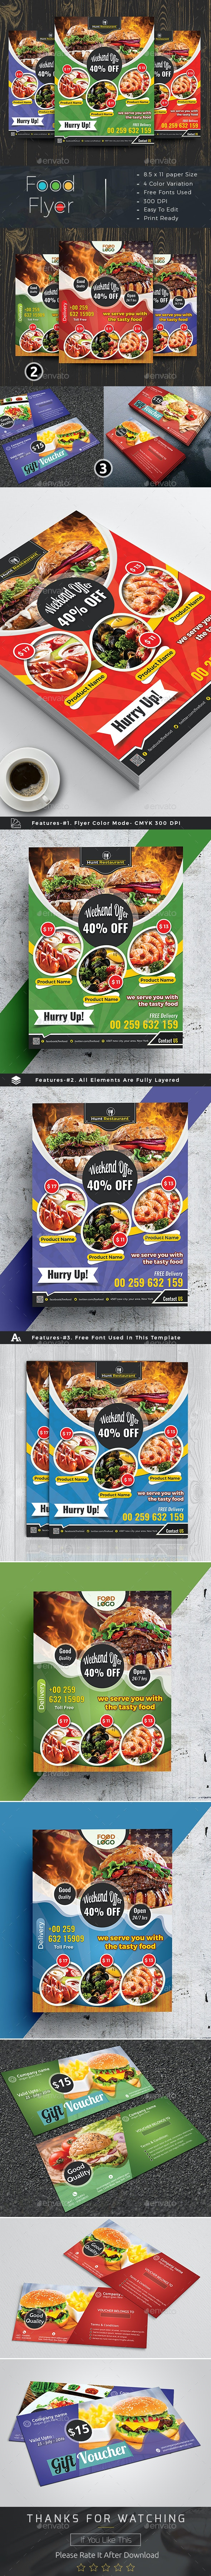 Restaurant Food Flyer - Business Cards Print Templates